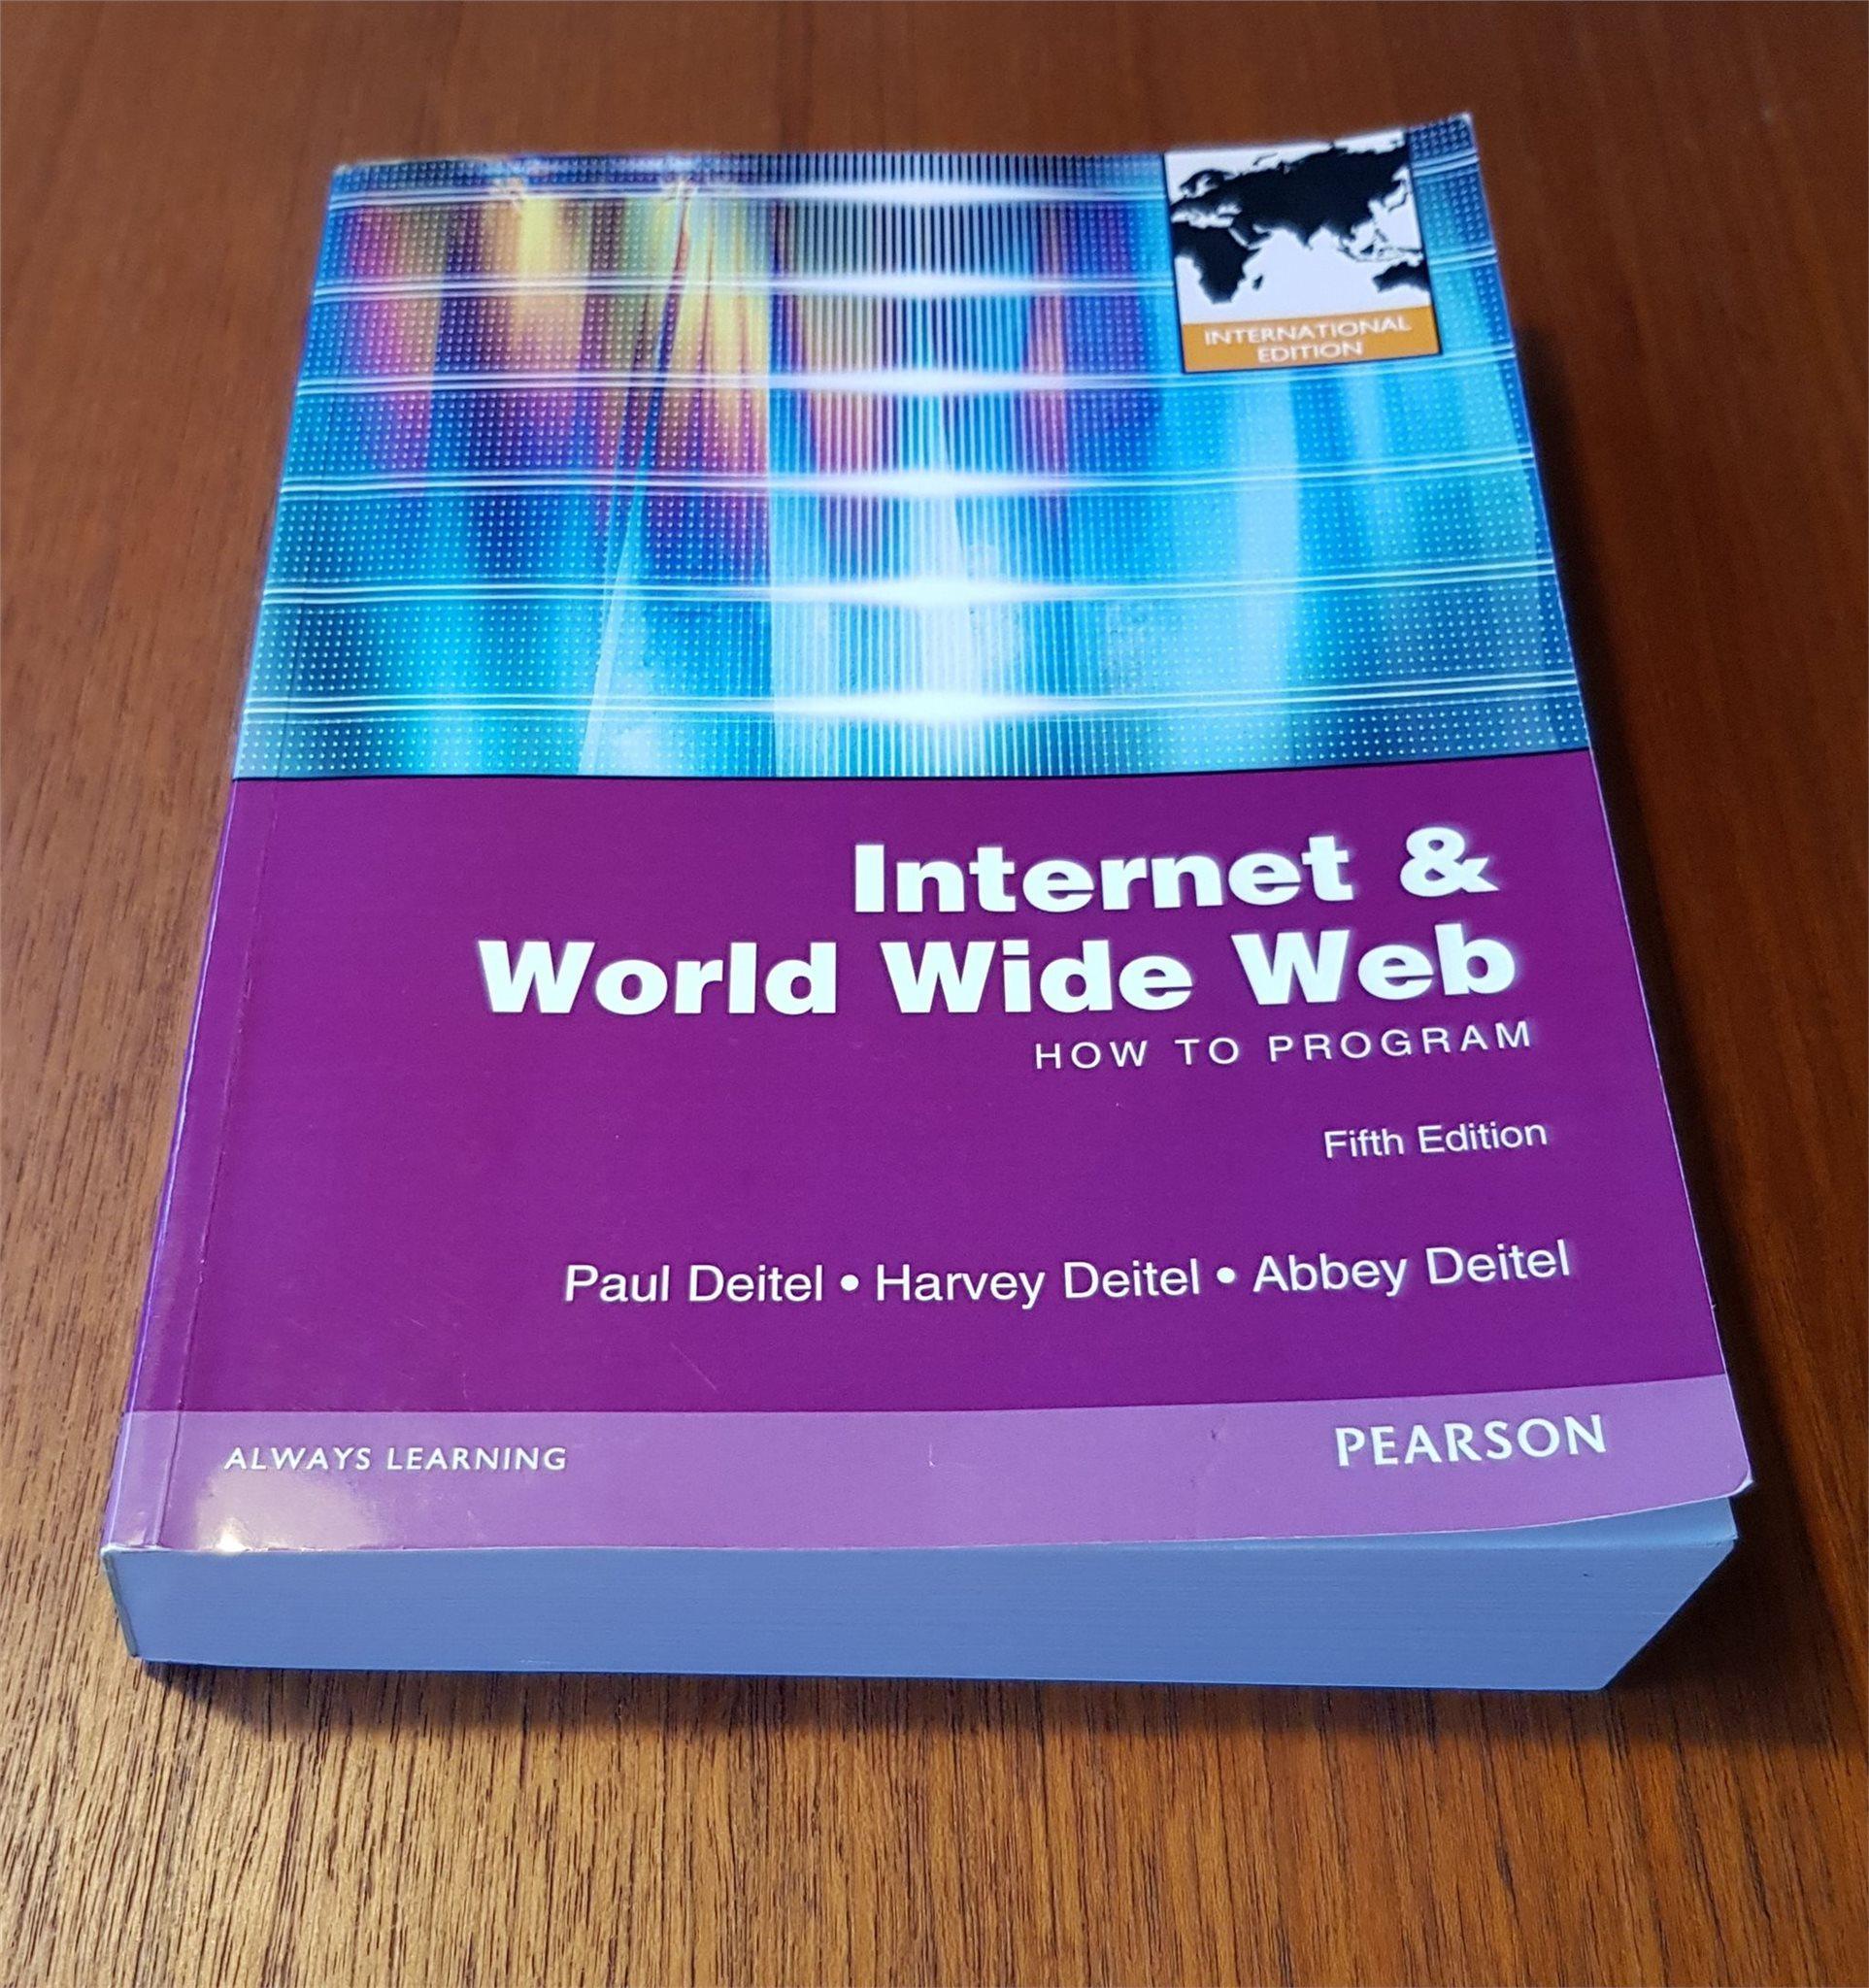 Internet & World Wide Web How To Program Fifth Edition Deitel ISBN 9780273764021